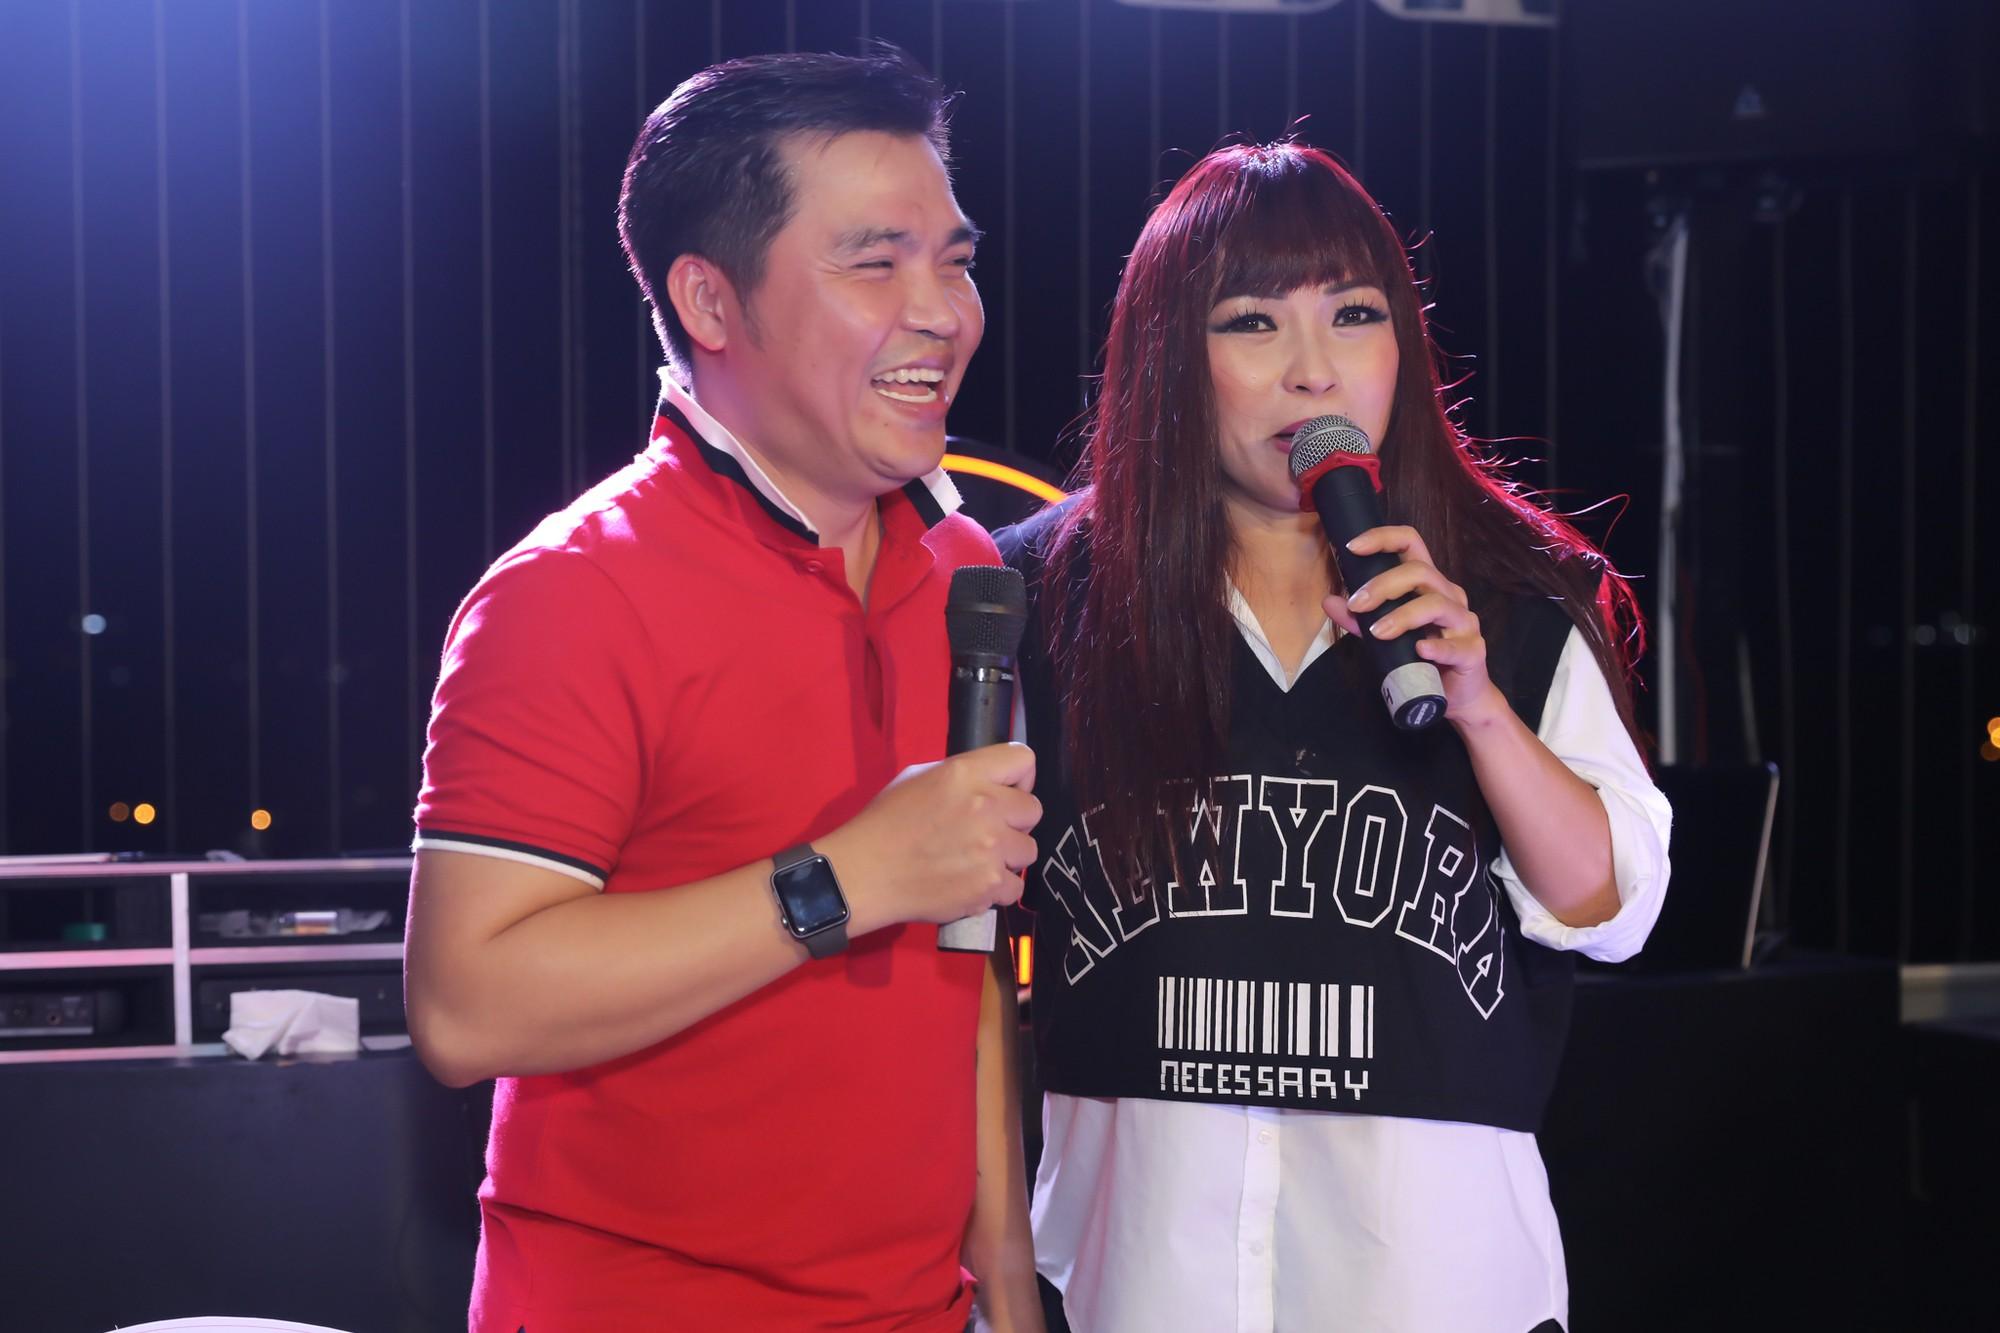 Le Minh MTV va man do giong cao vut cung Cahnh  (2)